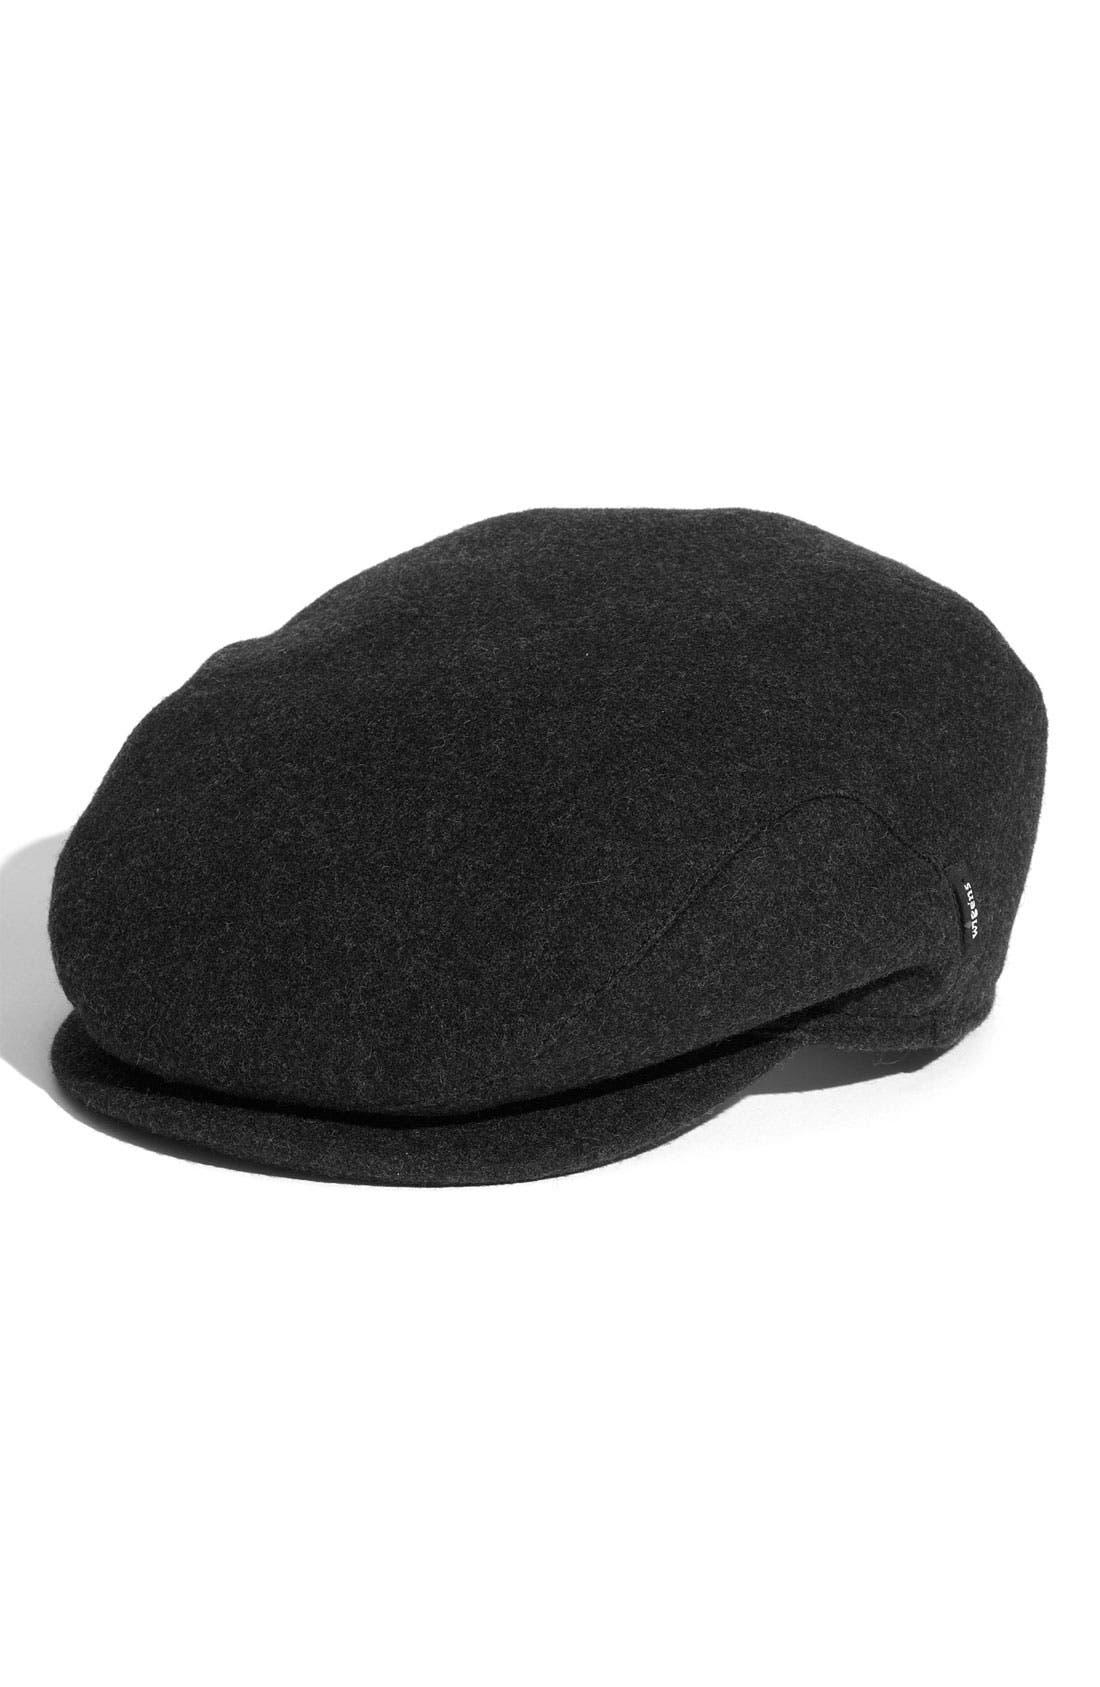 Alternate Image 1 Selected - Wigens Earflap Wool Driving Cap